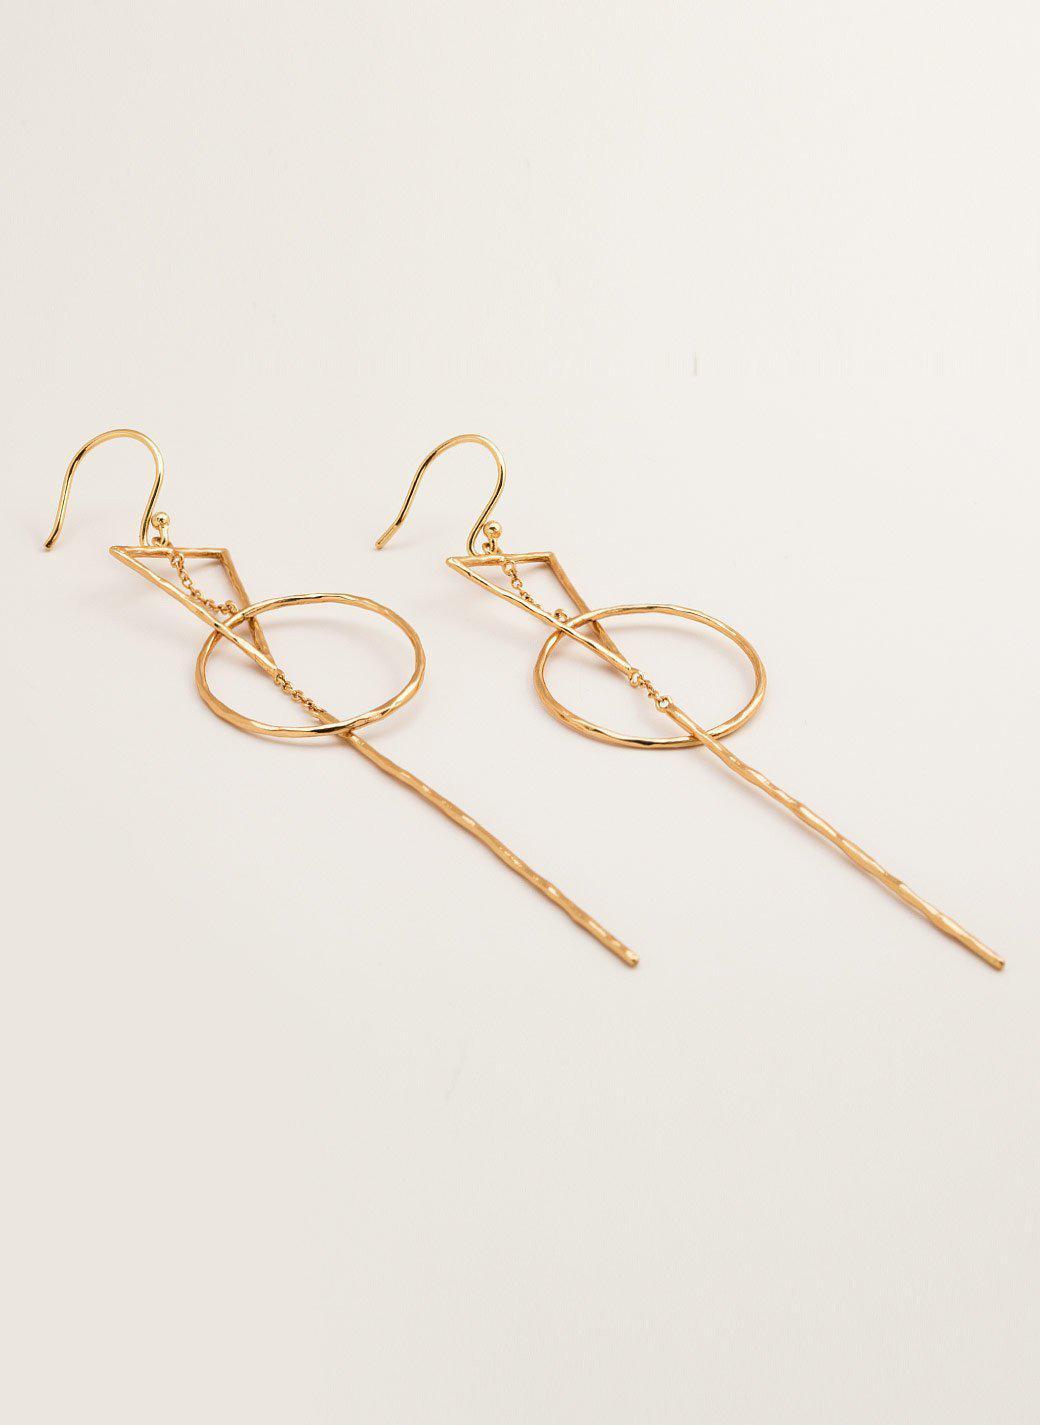 Interlocking Drop Earrings in Metallic Gold Gorjana l5M88JIQ